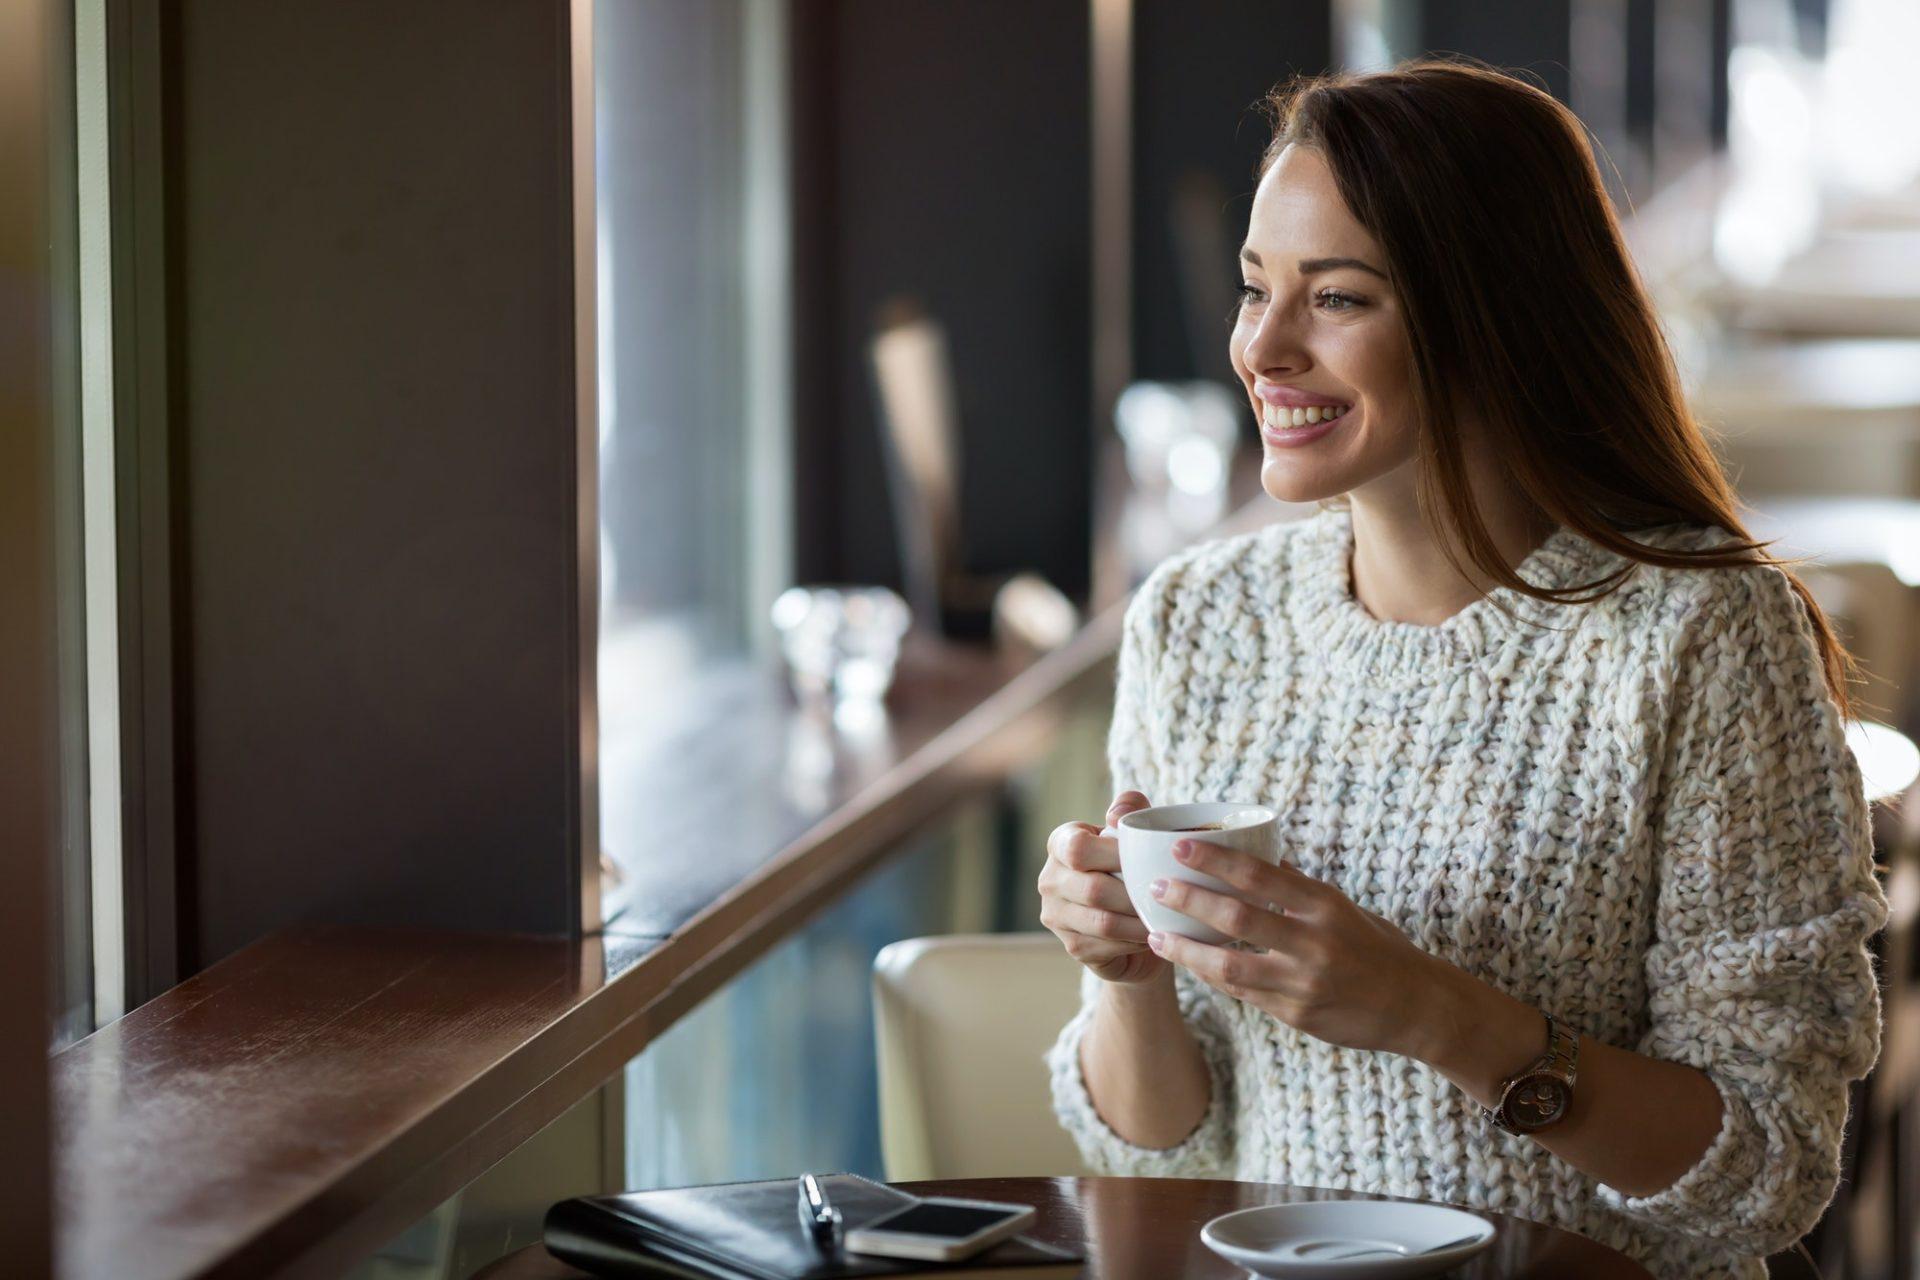 Beautiful woman drinking coffee in restaurant alone